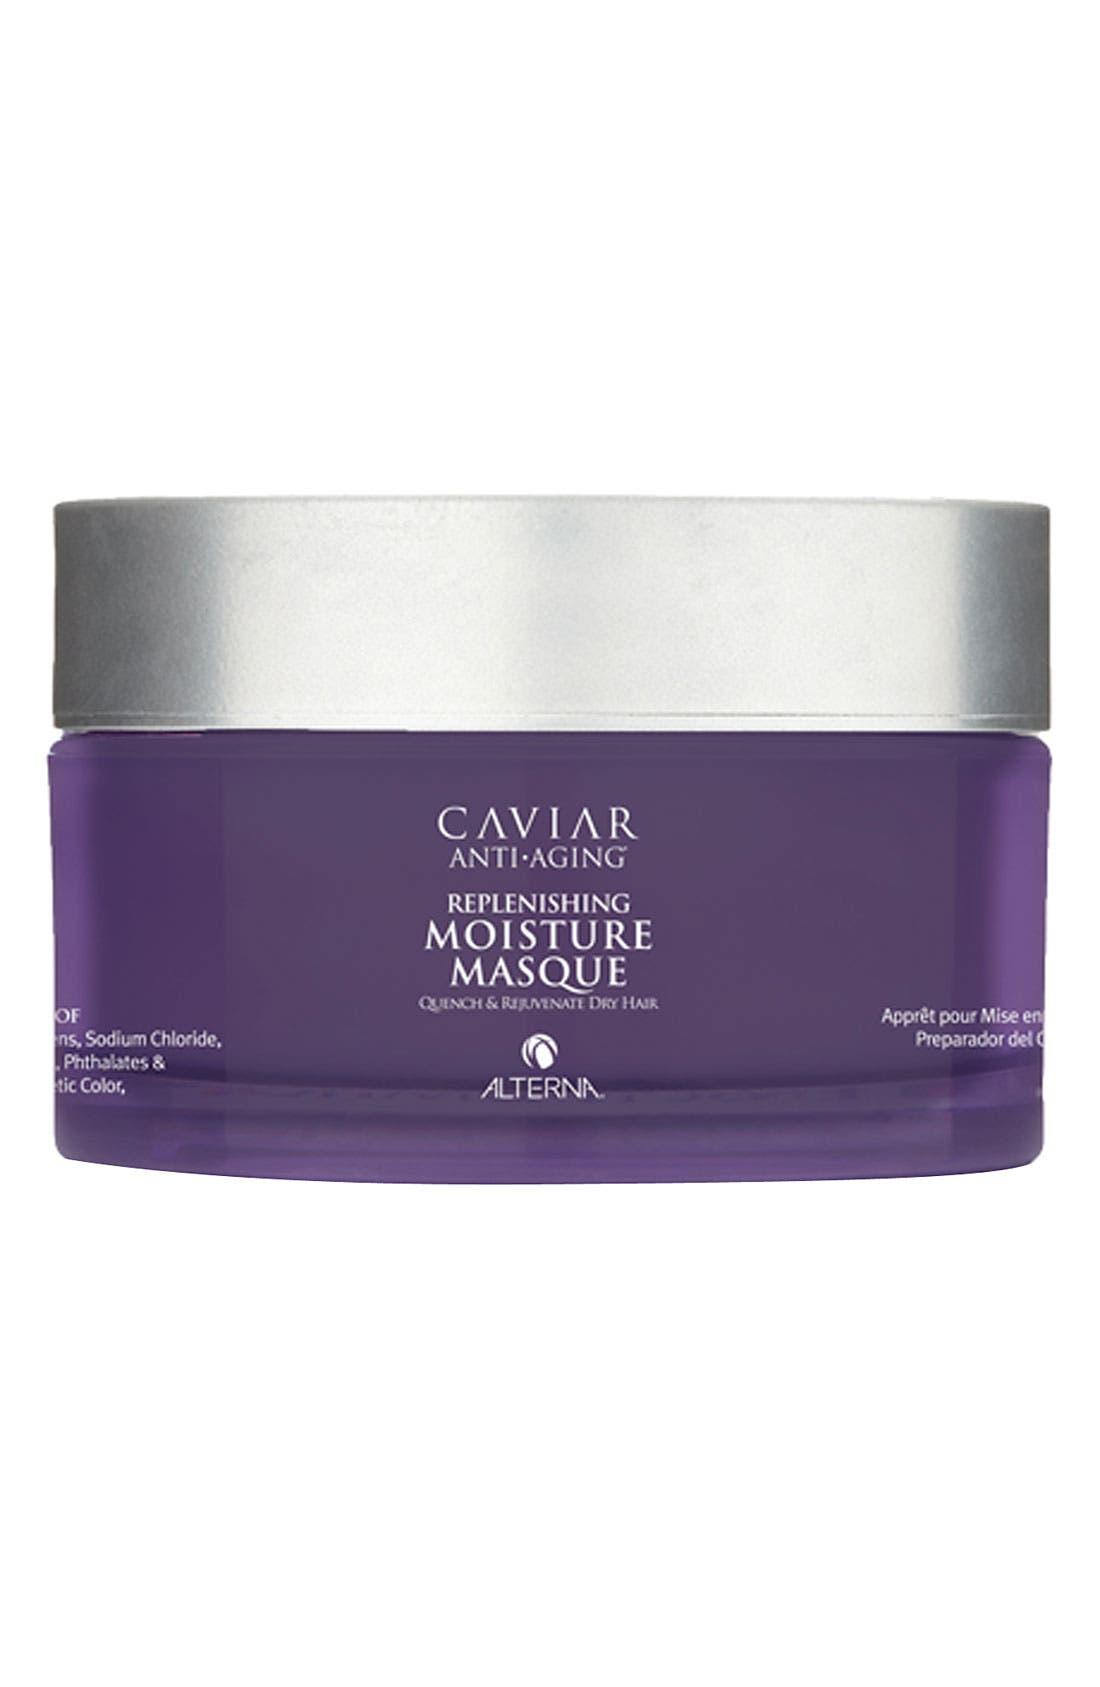 Caviar Anti-Aging Replenishing Moisture Masque,                             Main thumbnail 1, color,                             000